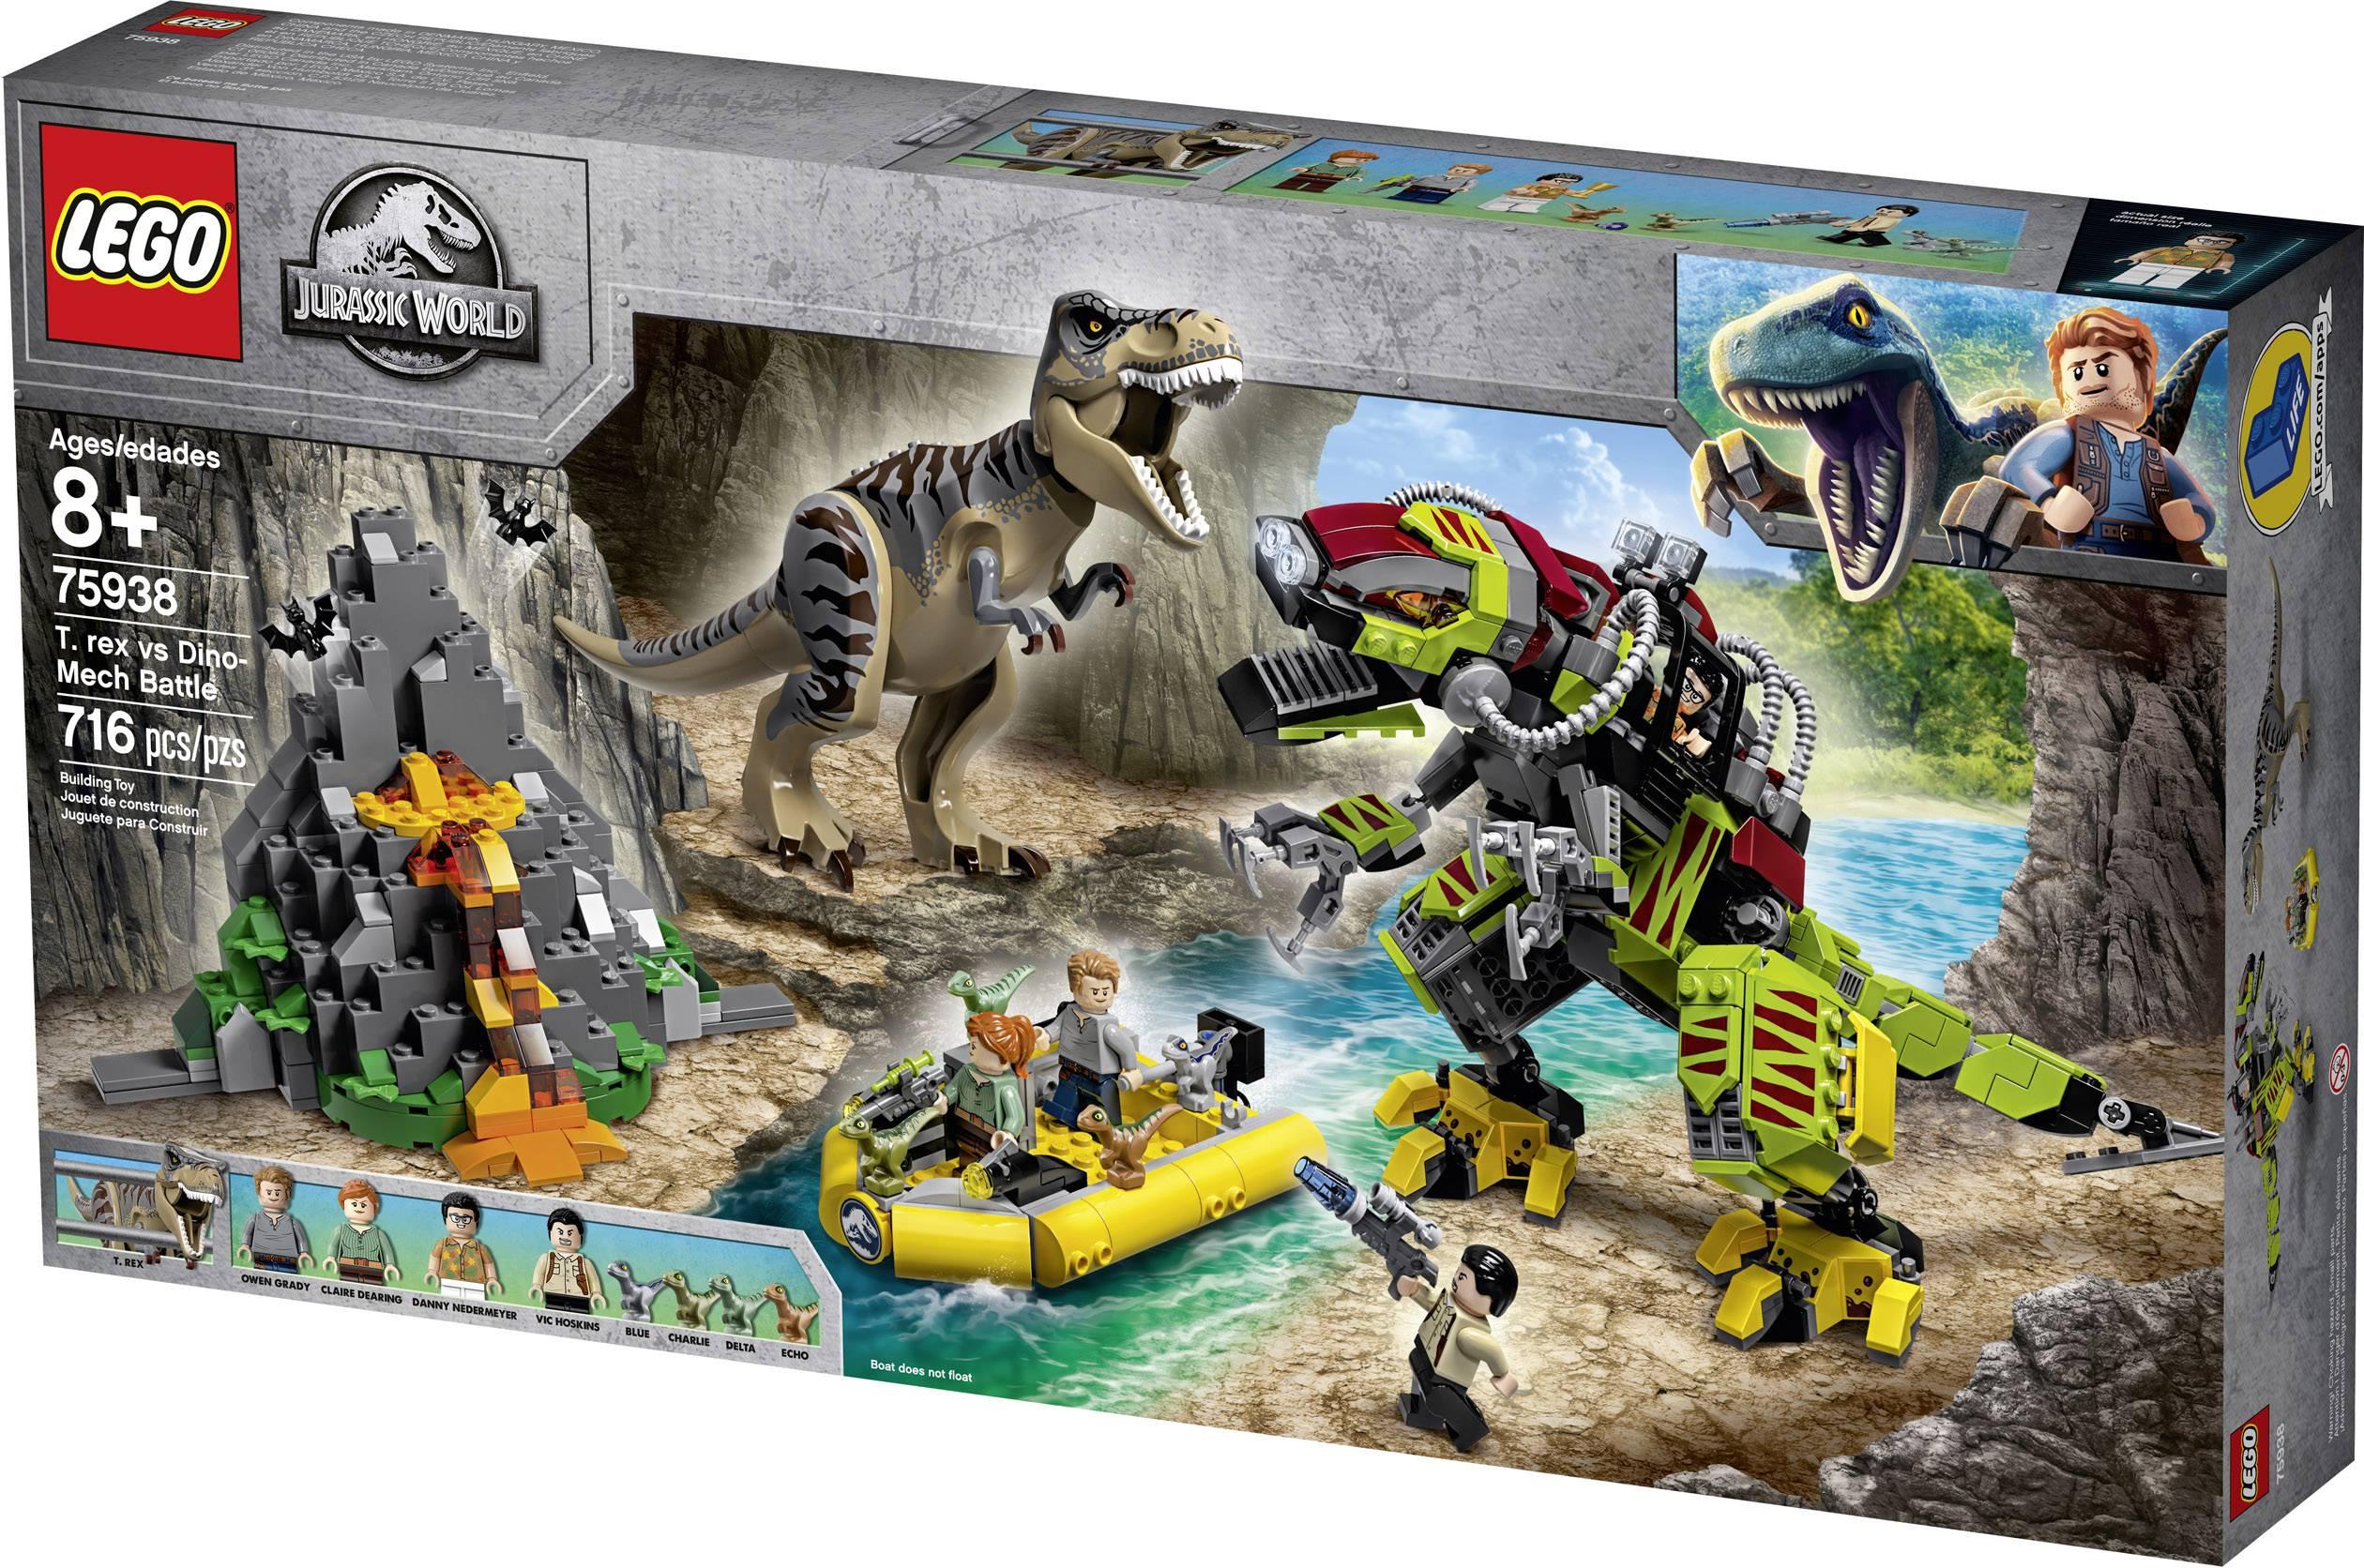 2x LEGO® Kopf Ninjago Schlange Reptil Lassa 3626cpb0667 NEU Lime Hell Grün